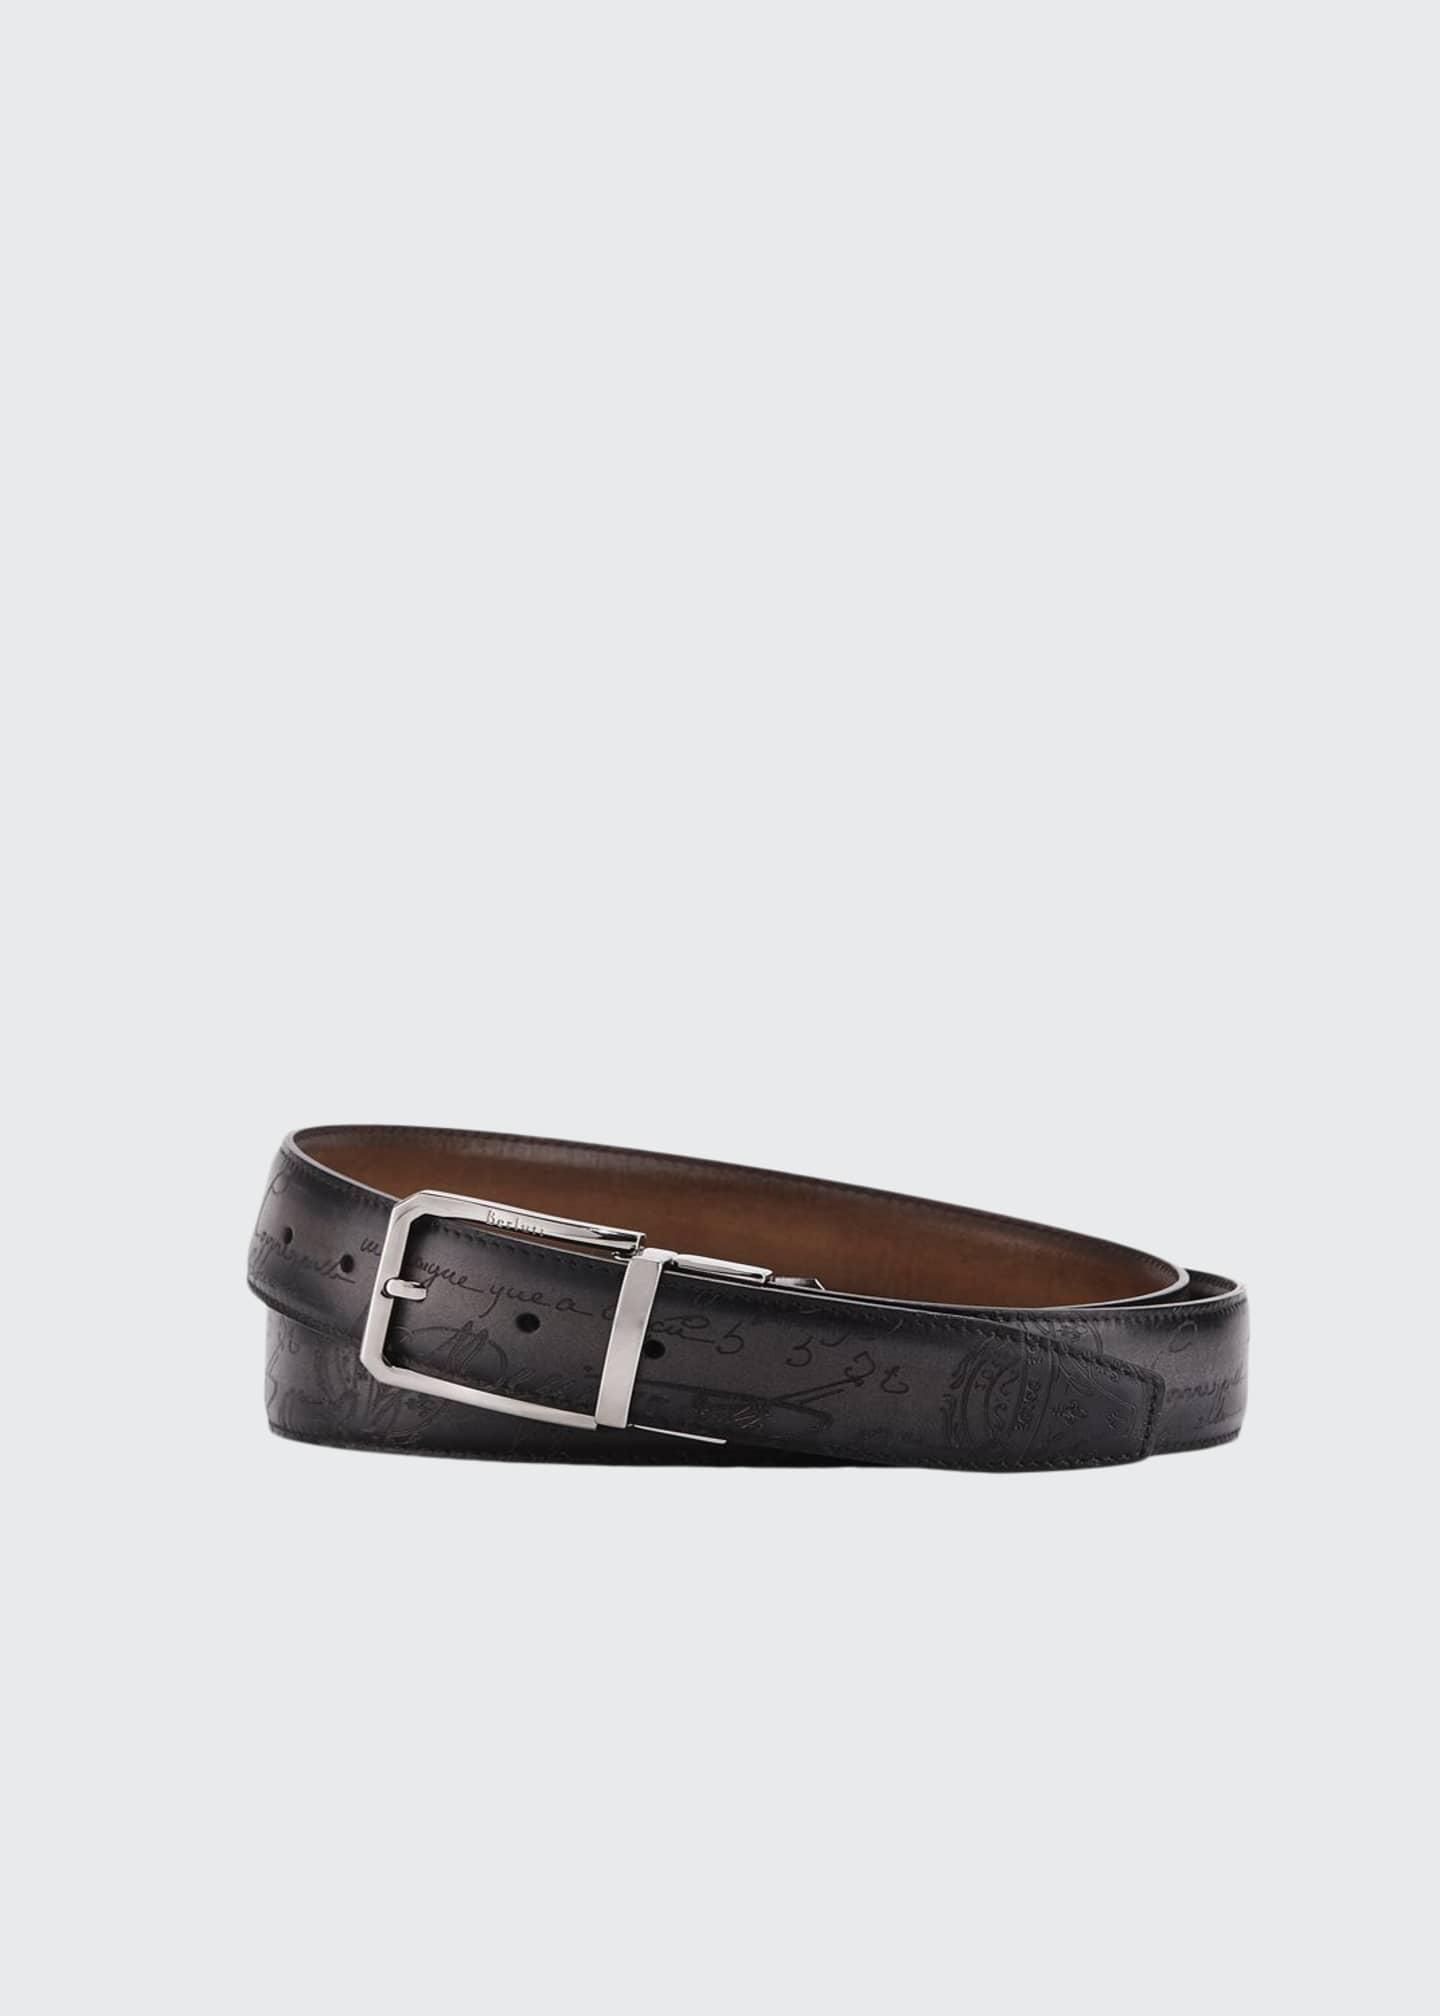 Berluti Reversible Scritto Leather Belt